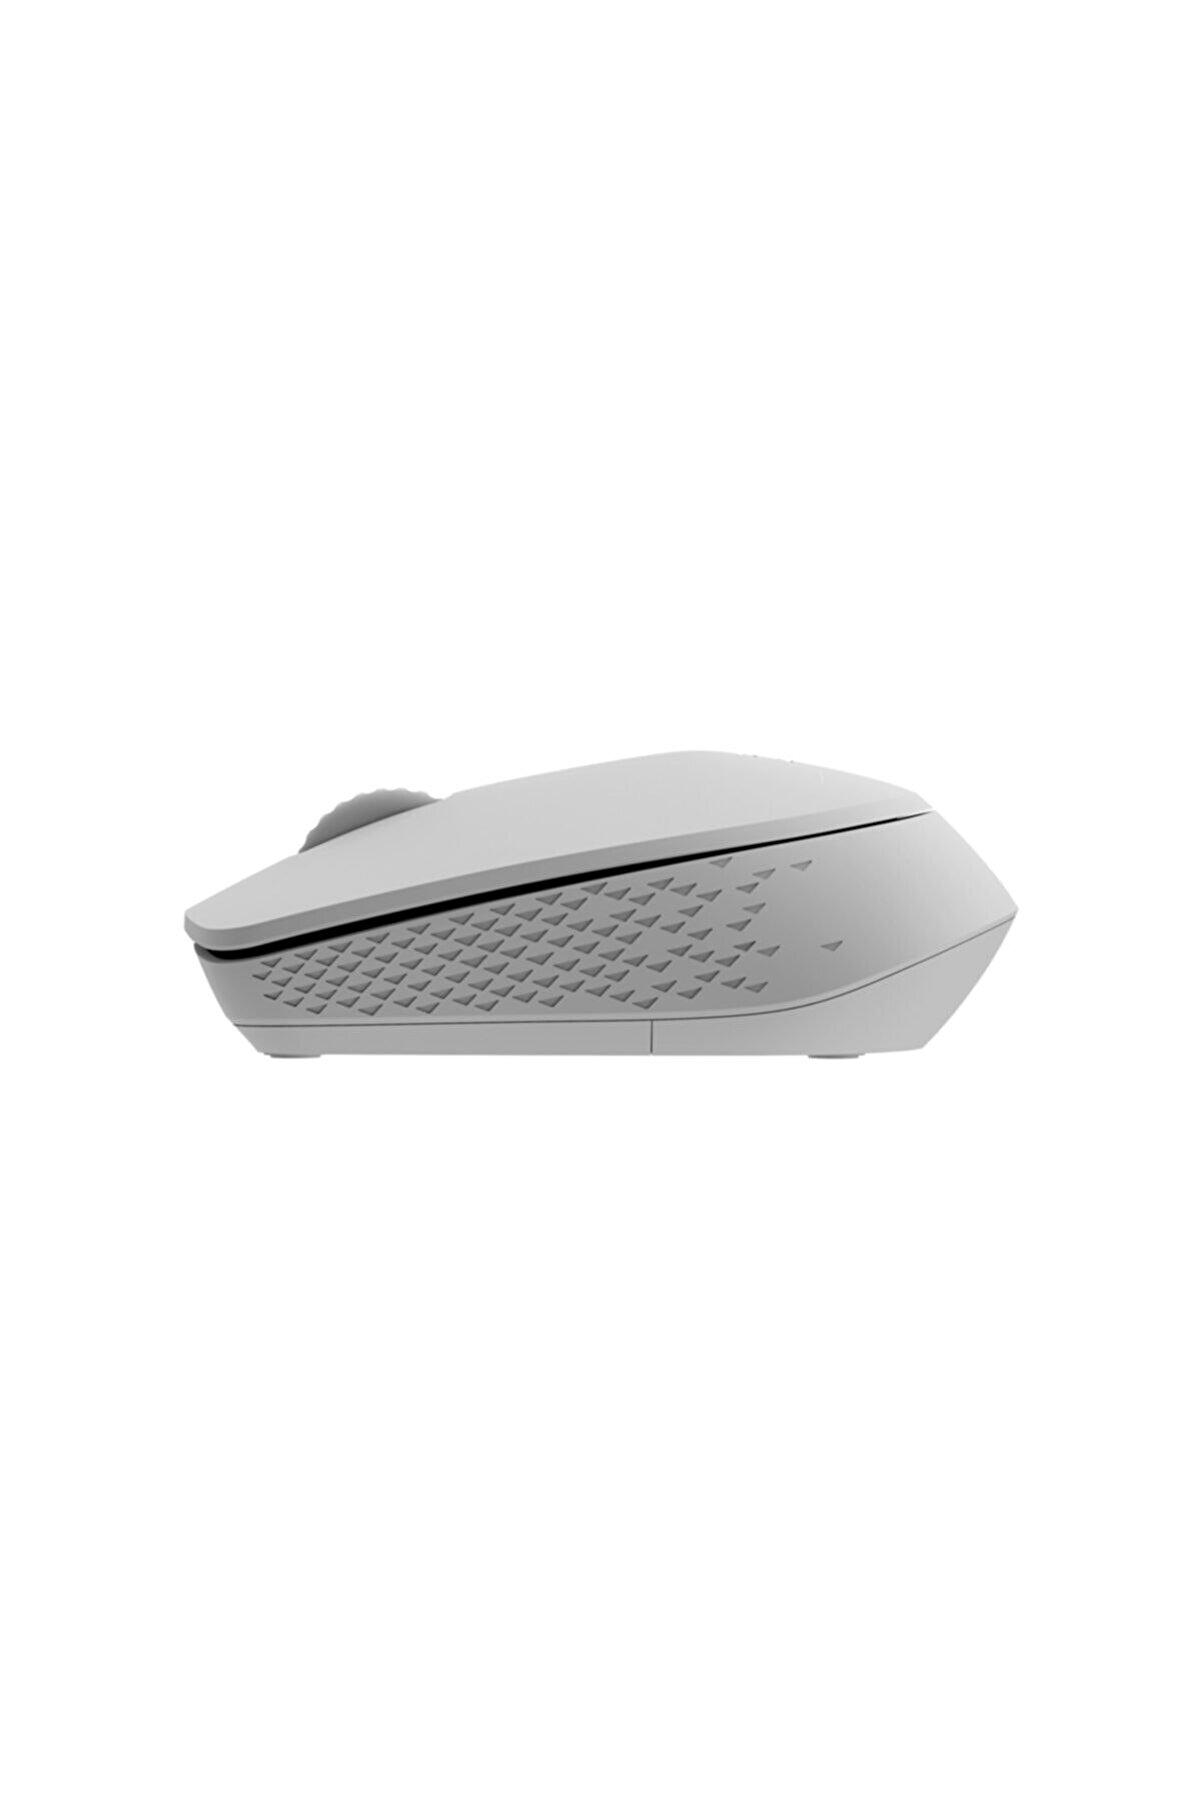 Rapoo M100 Comfortable Silent Multi-mode Mouse